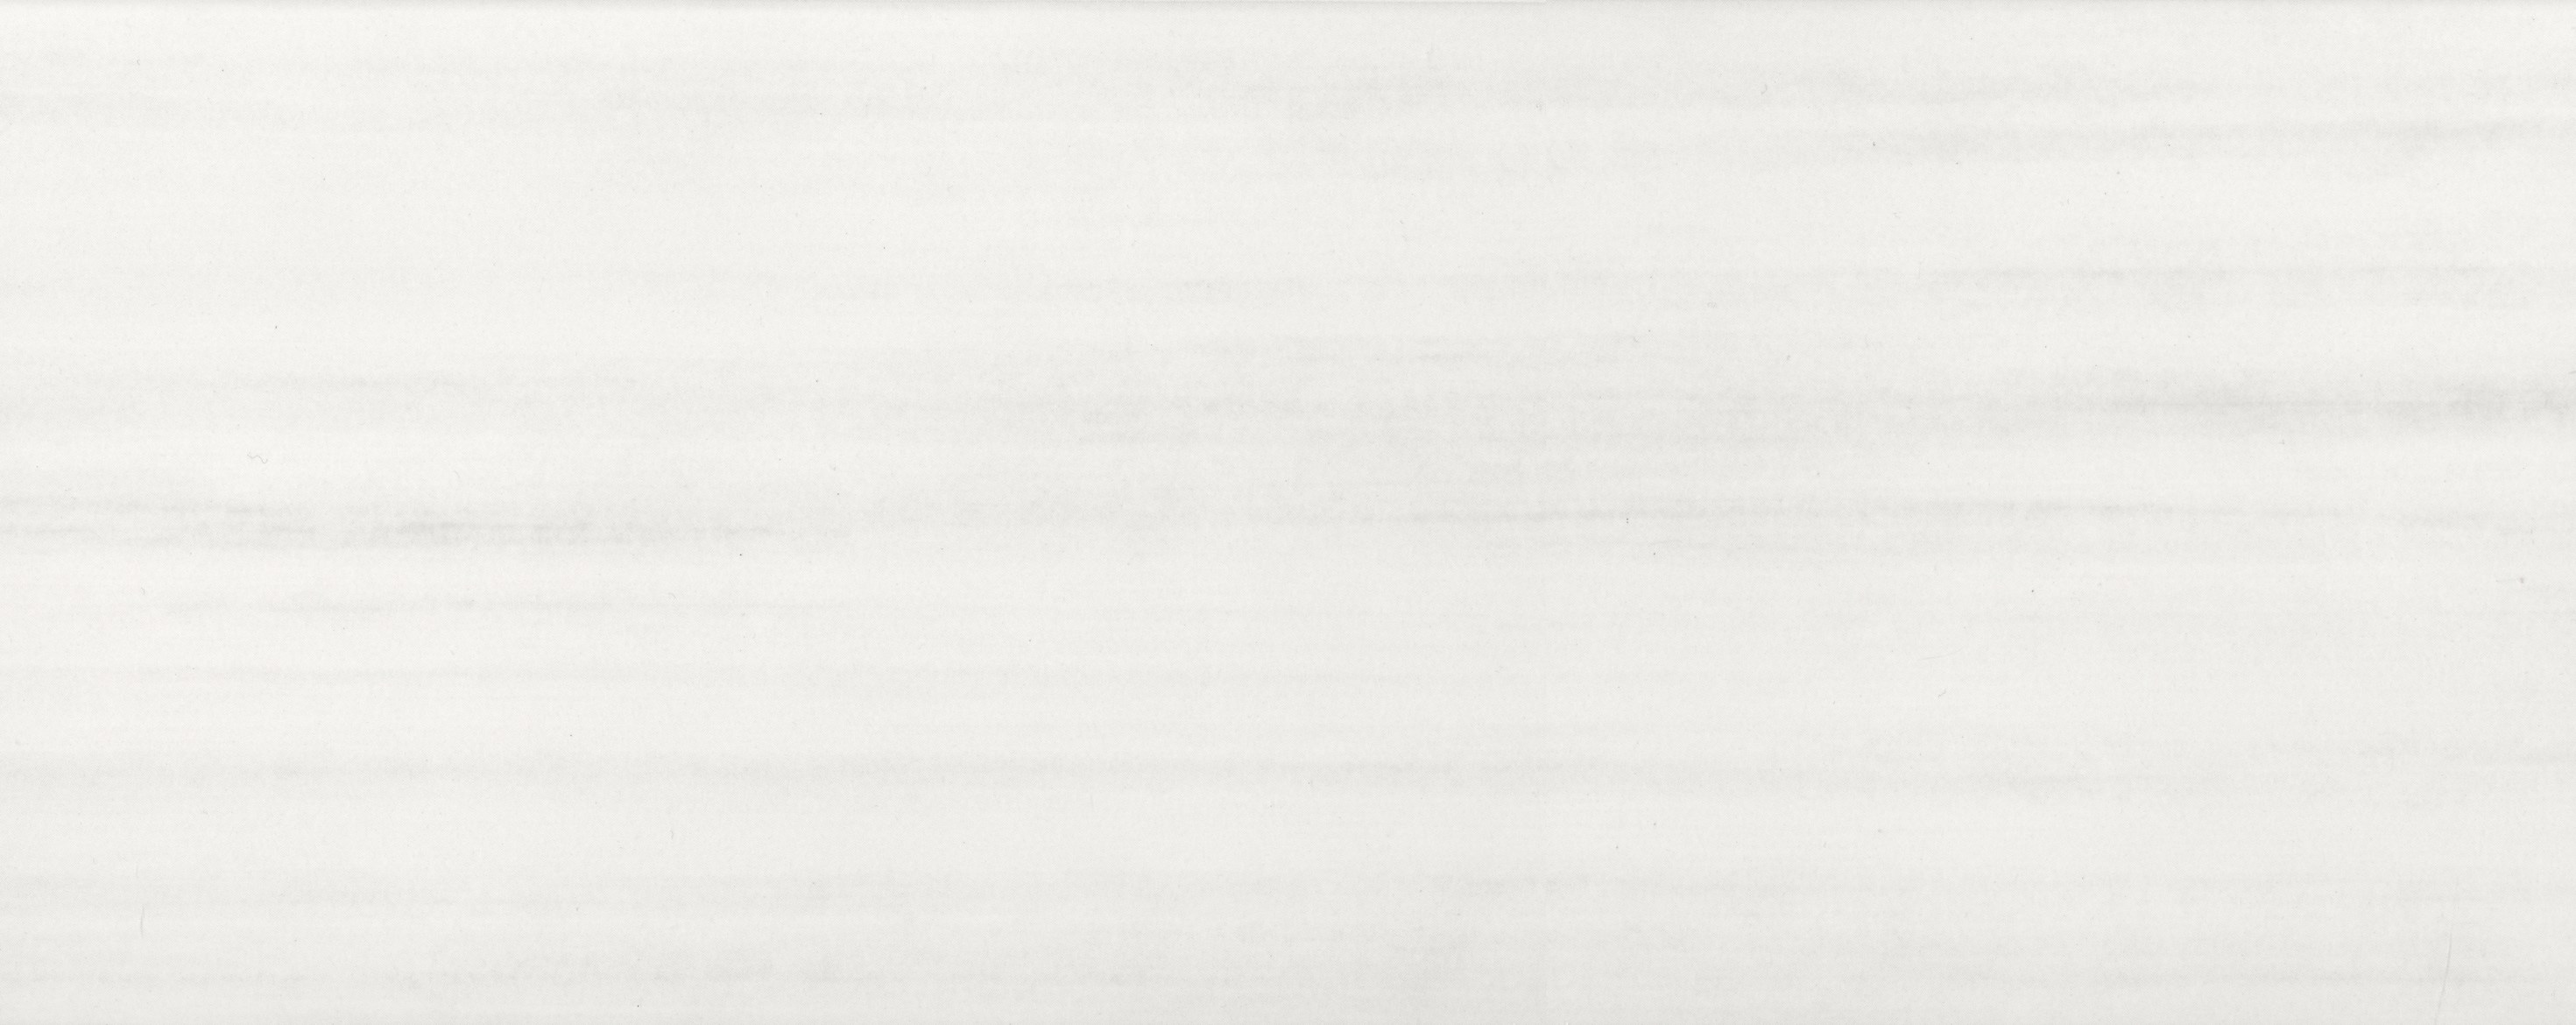 Dakar weiss grau matt DAK11A 20x50x0,8 II sort - Hansas Plaadimaailm